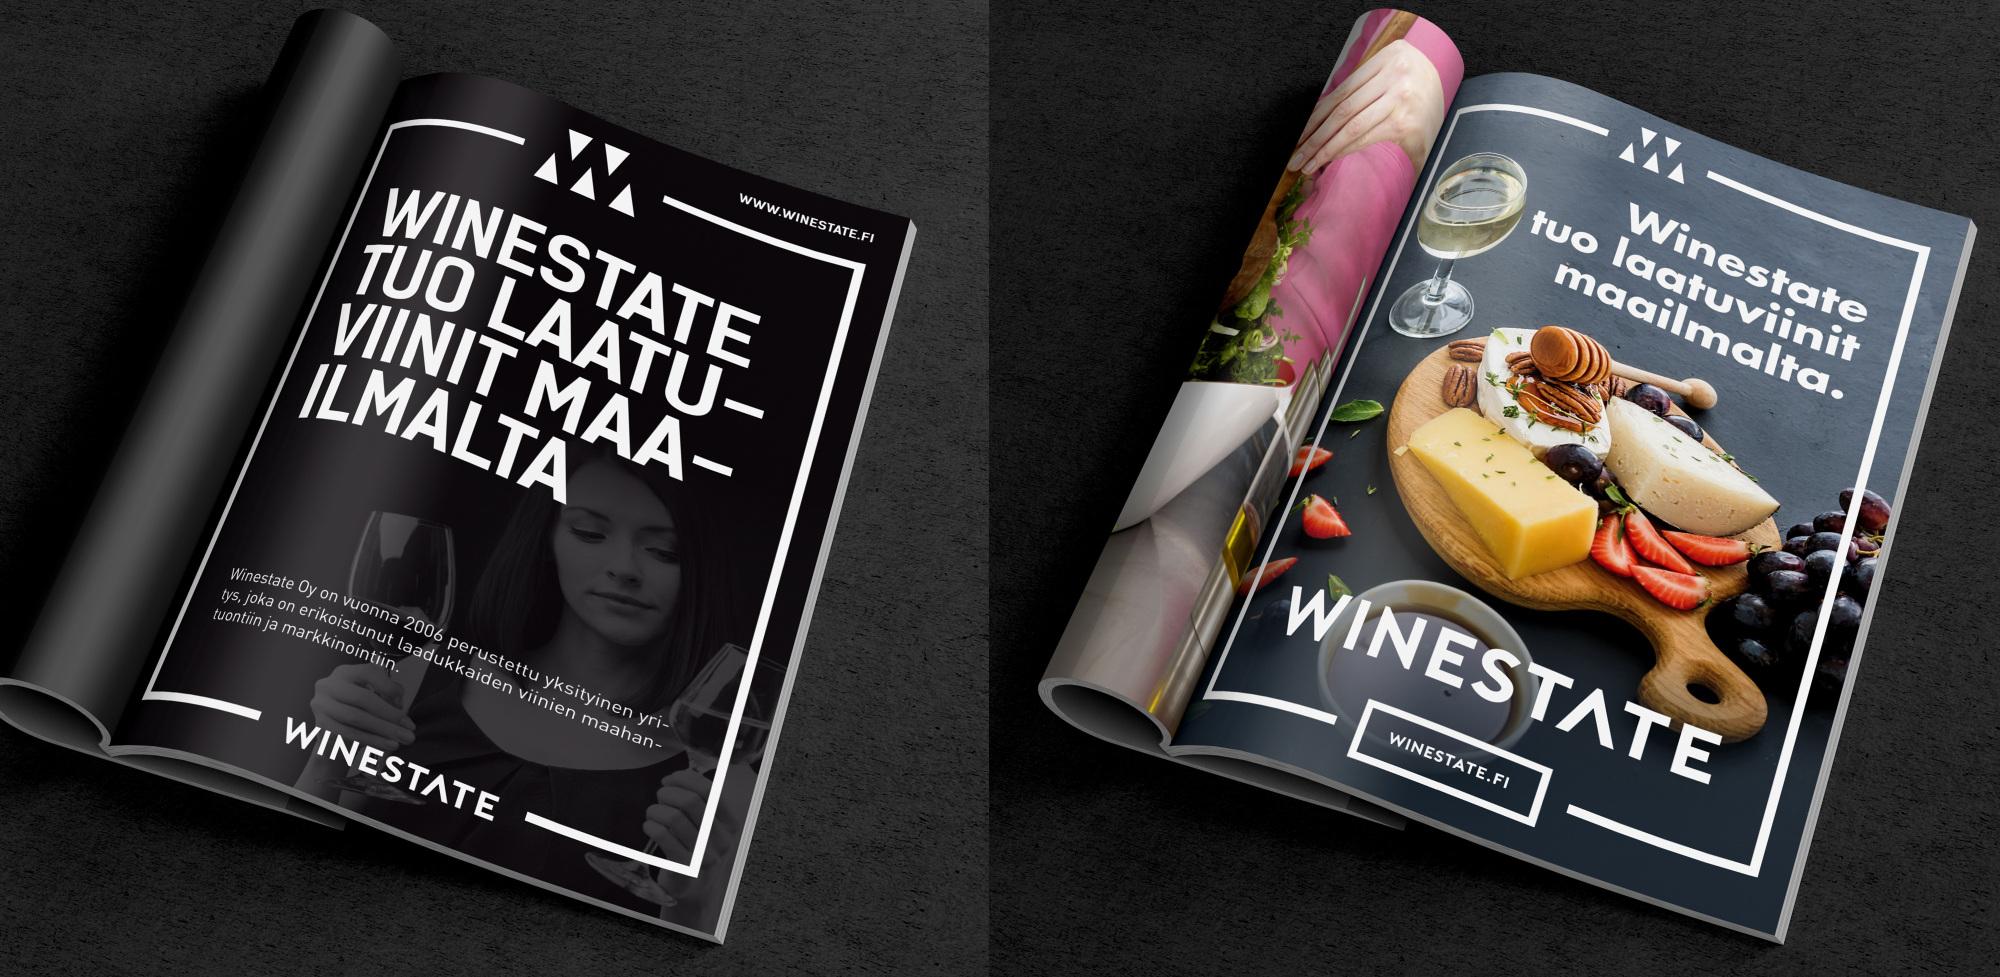 bm_winestate11